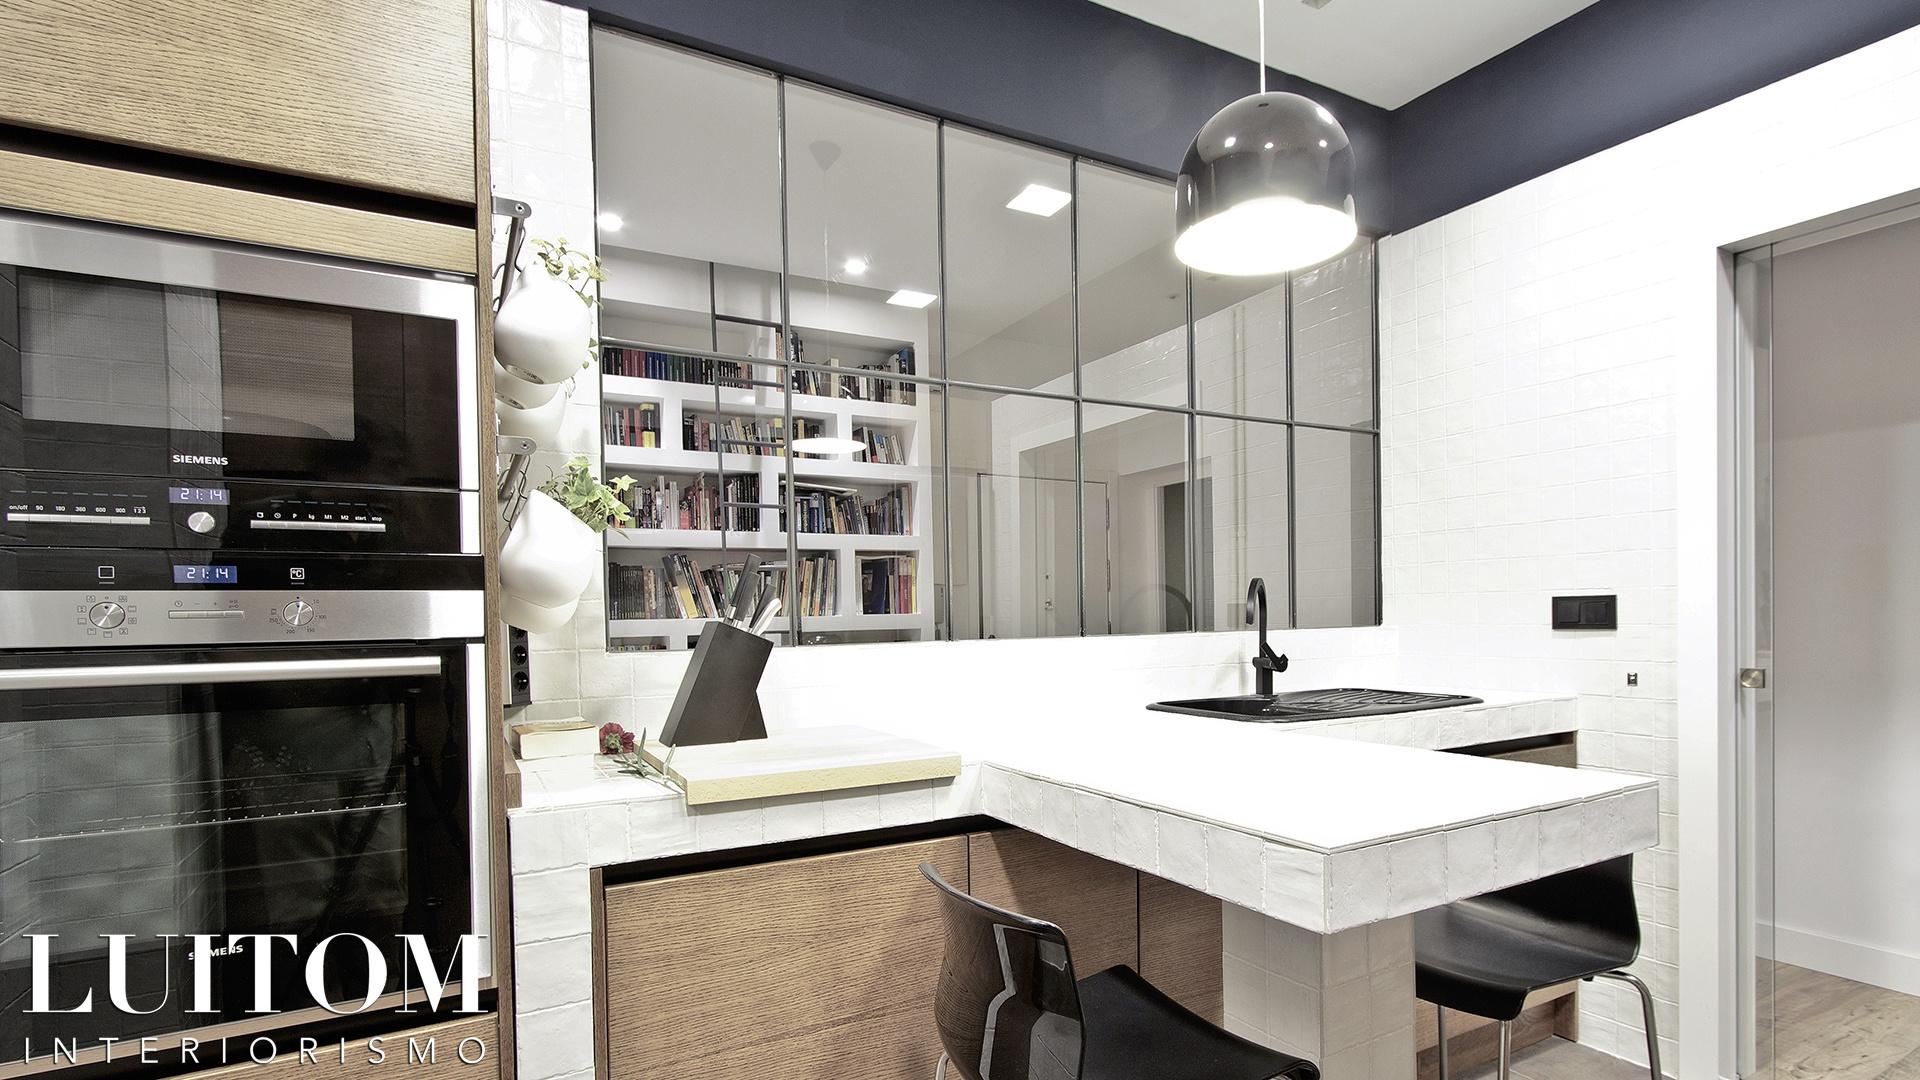 cristaleras-cocinas-pared-cristal-separacion-cocina-salon-cristalera-metalica-madera-blanca-negra-20